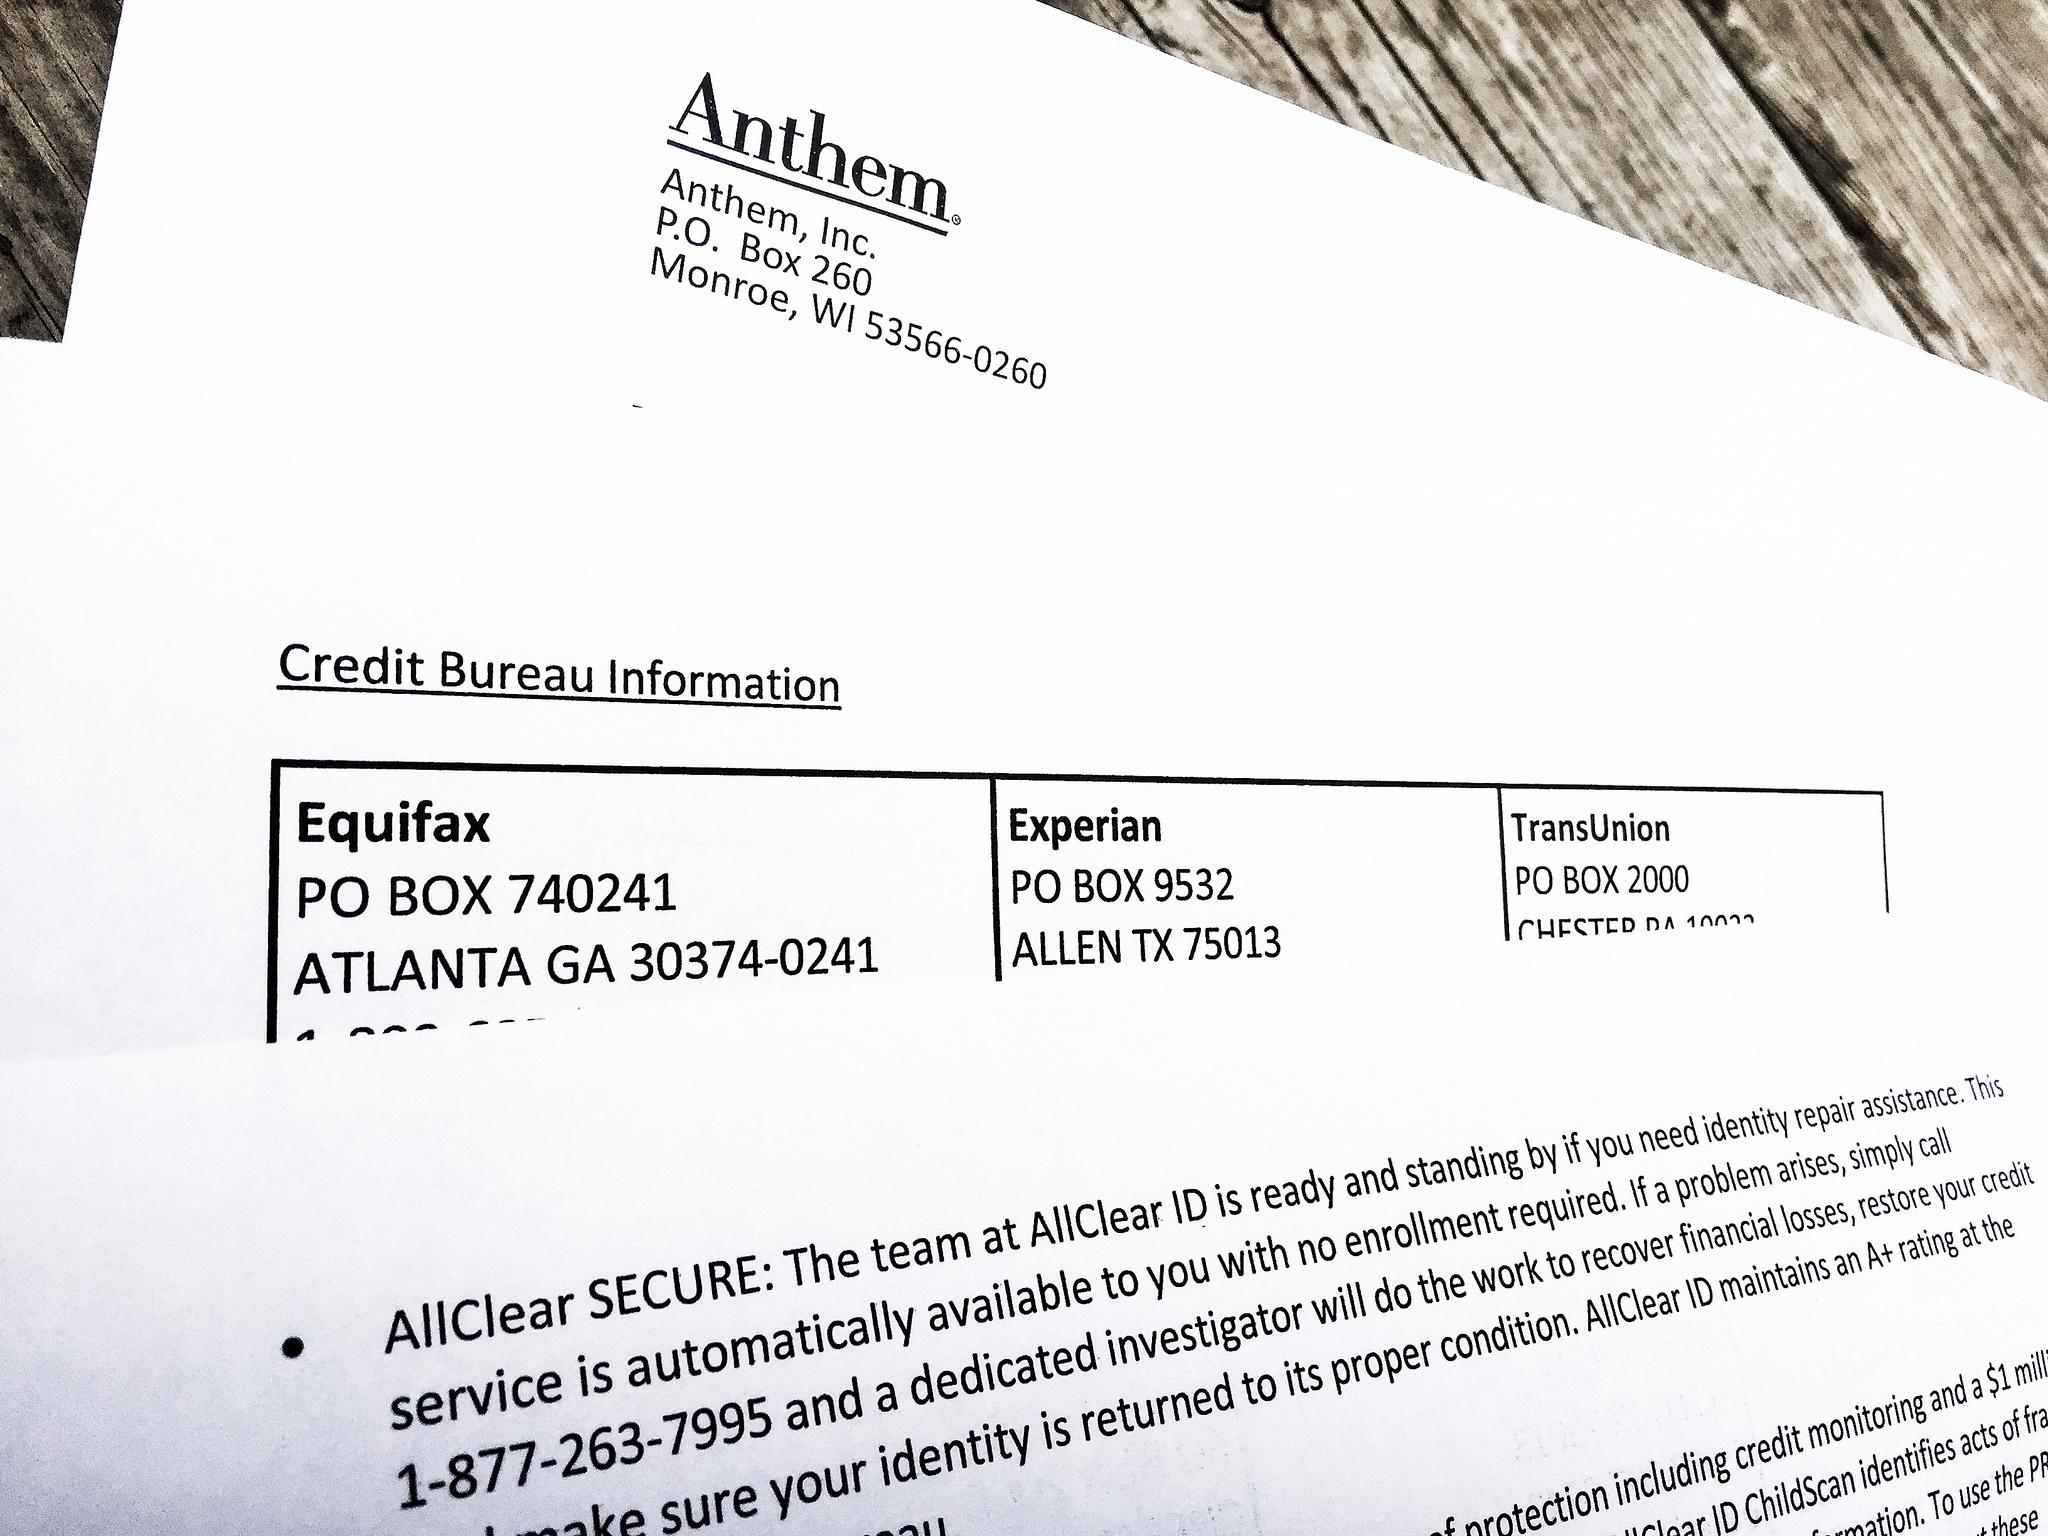 Anthem Agrees to Settle 2015 Data Breach for $115 Million